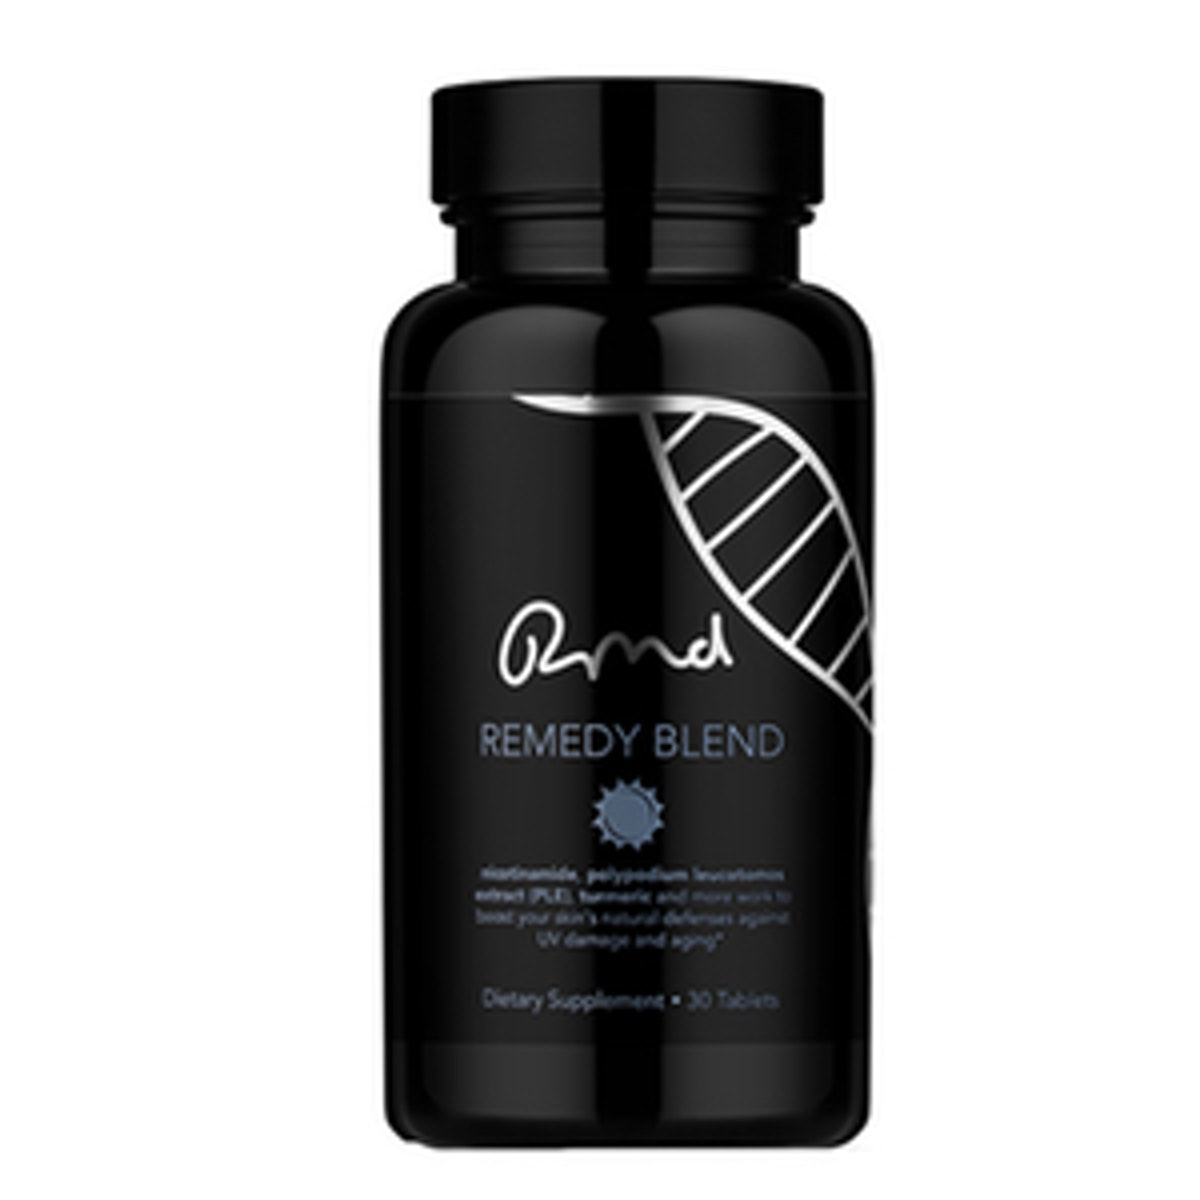 Remedy Blend